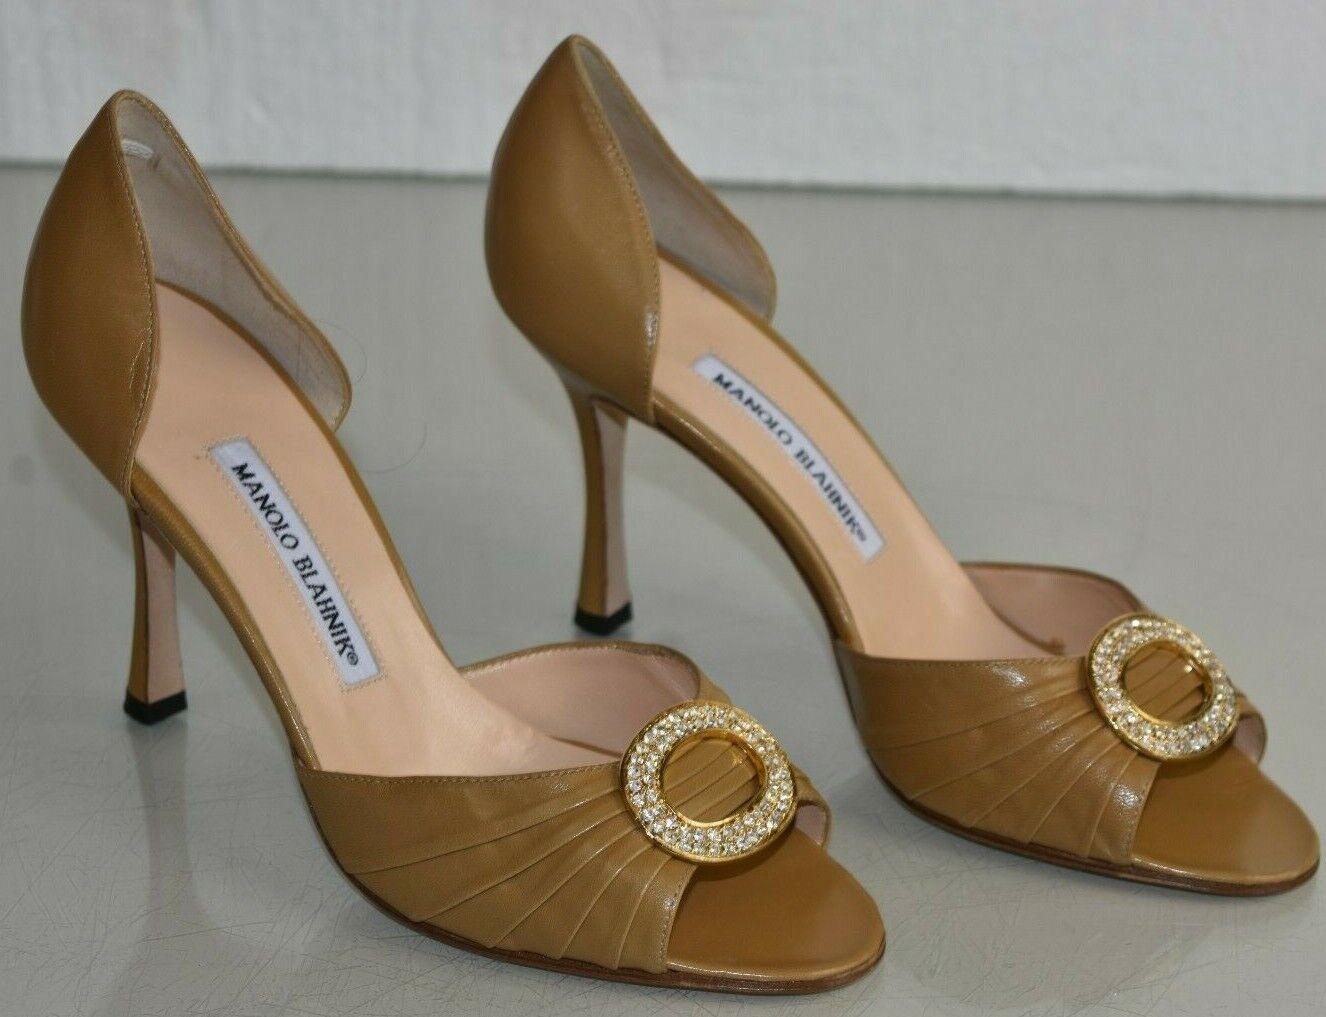 Neu Manolo Blahnik Sedaraby Kamel Beige Leder Jeweled Absatz Schuhe 38.5 41